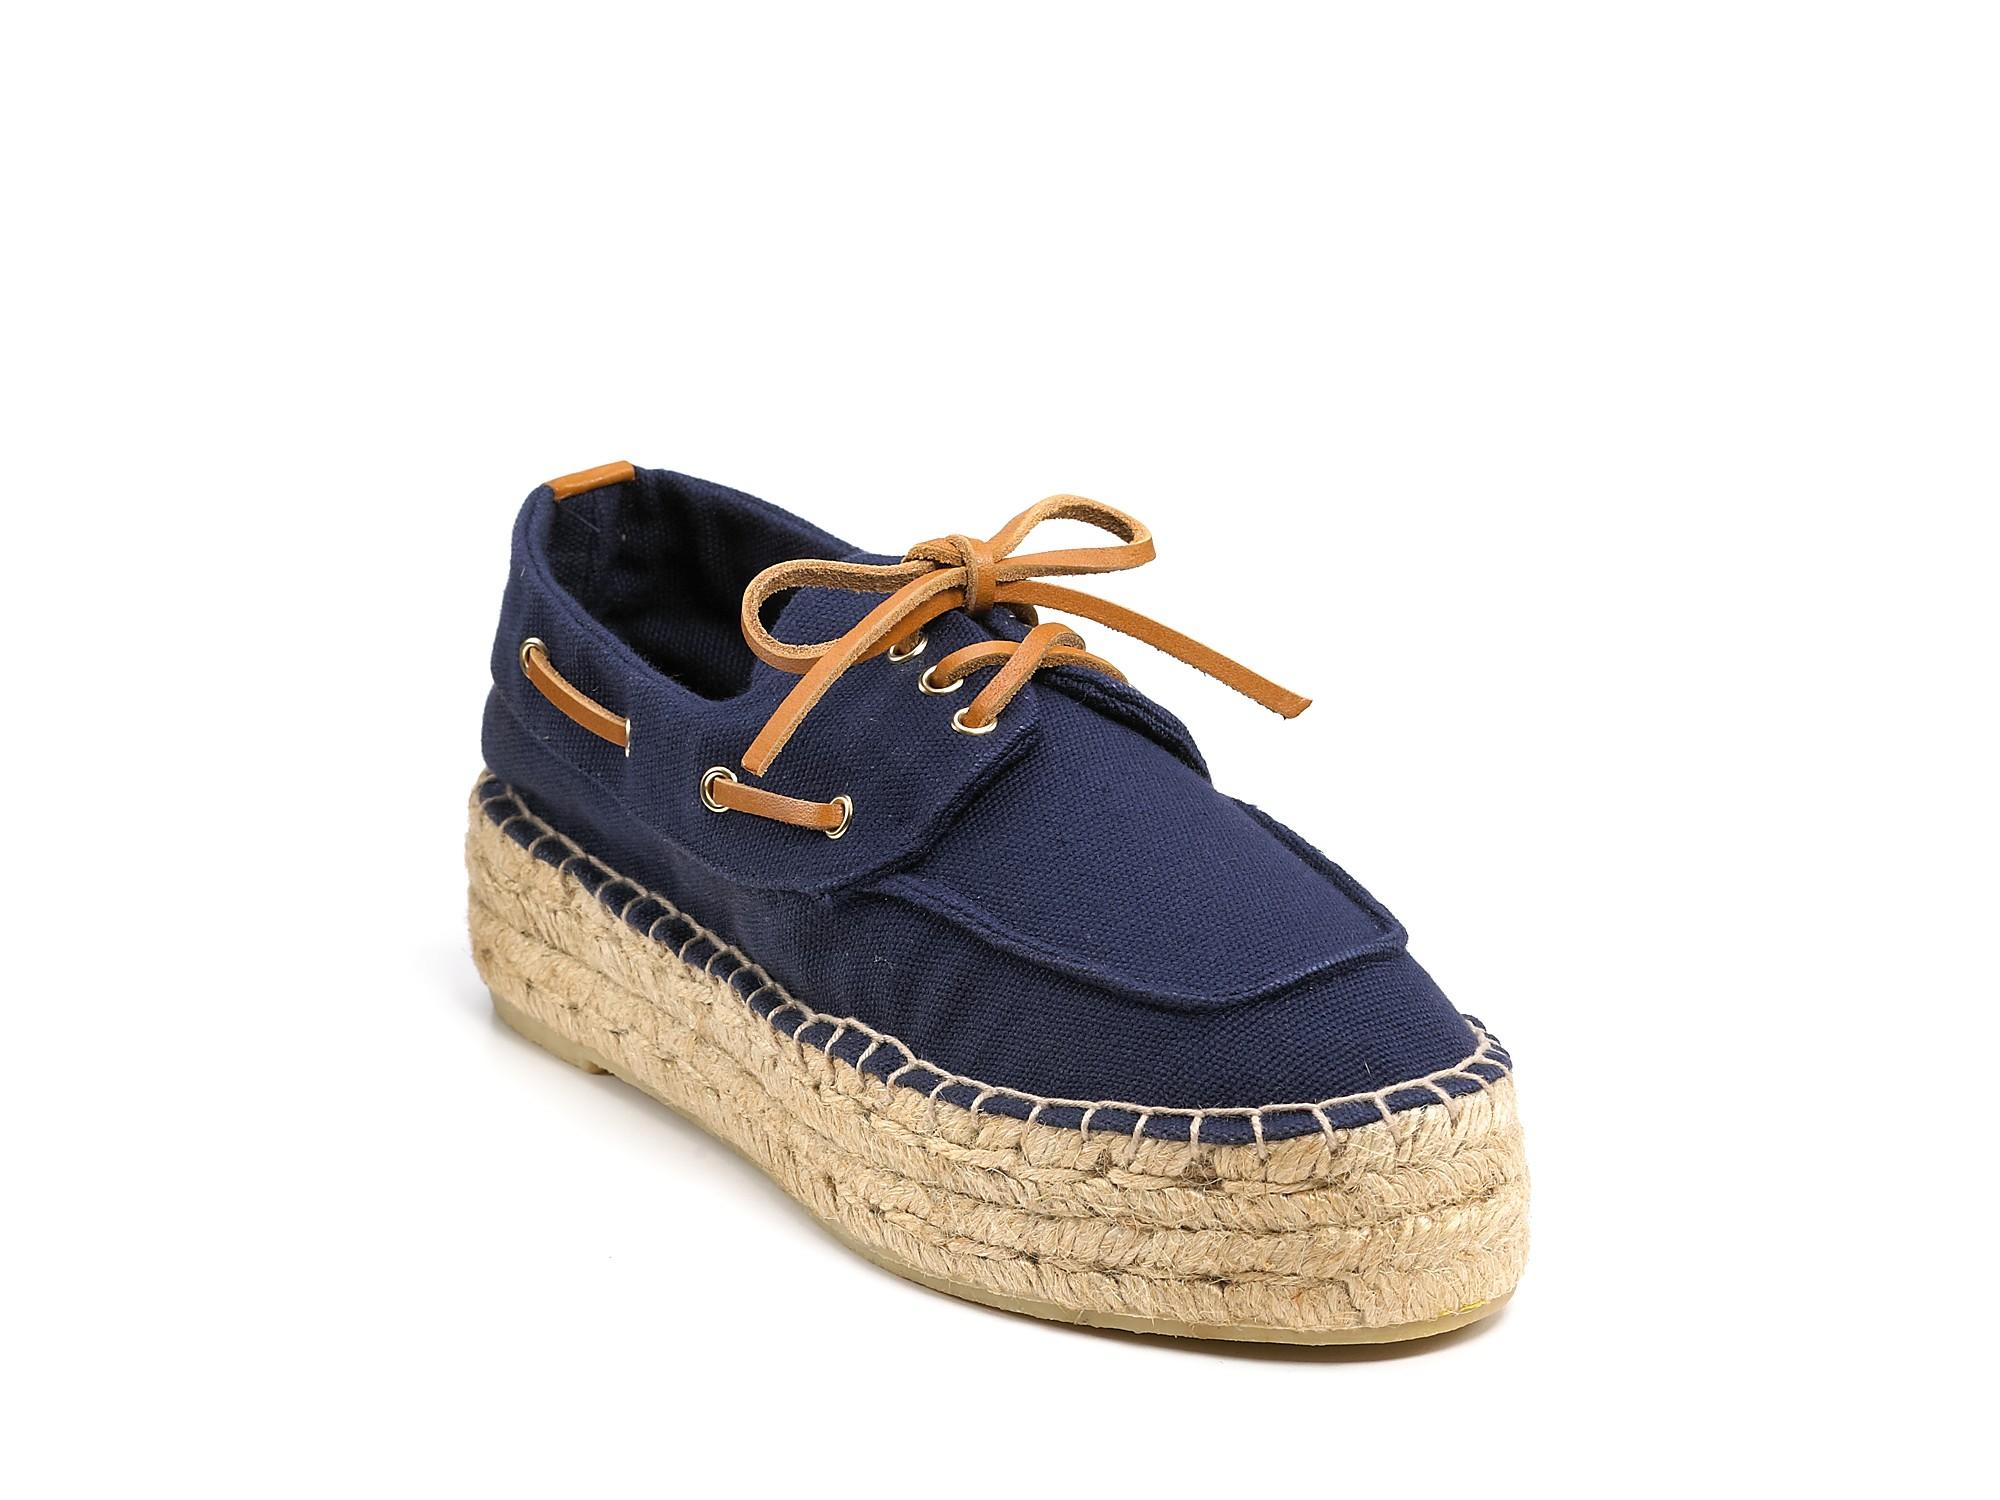 Tory Burch Espadrilles Blanton Boat Shoes In Blue Lyst